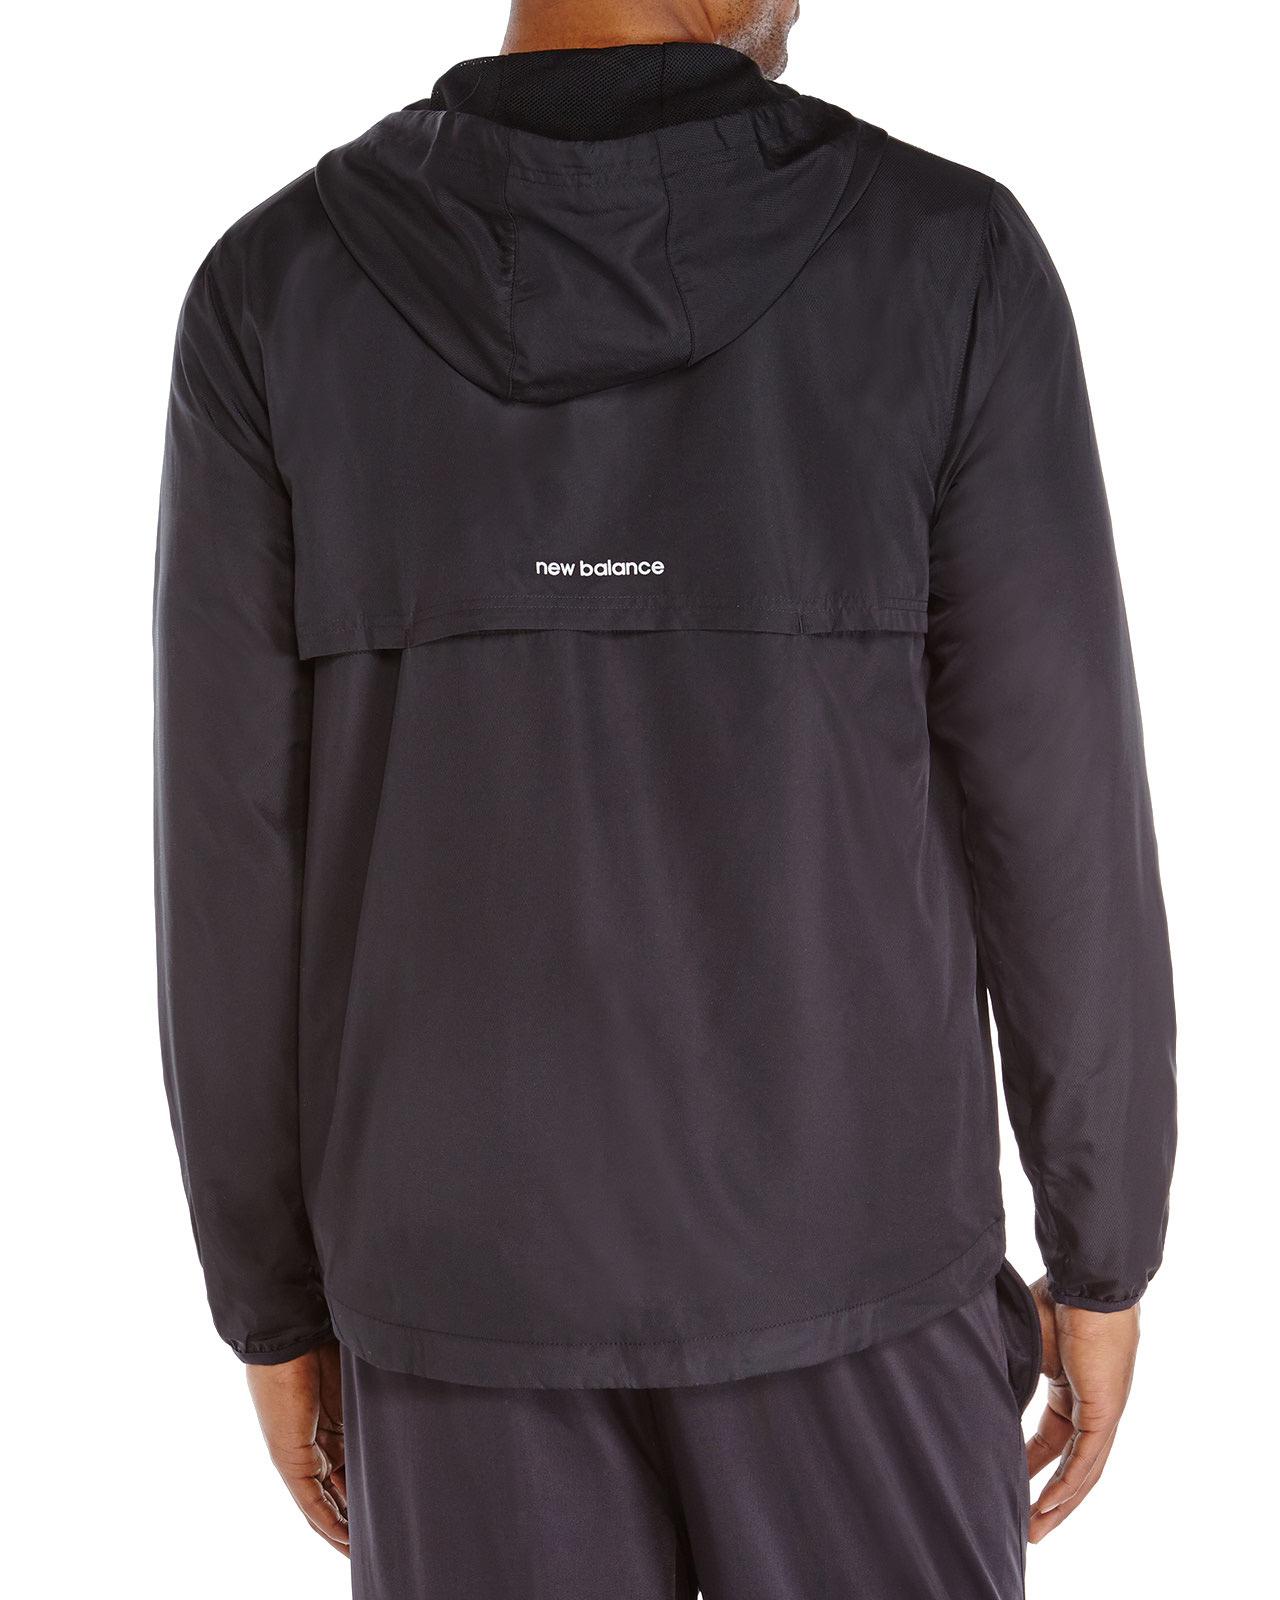 new balance jackets sale